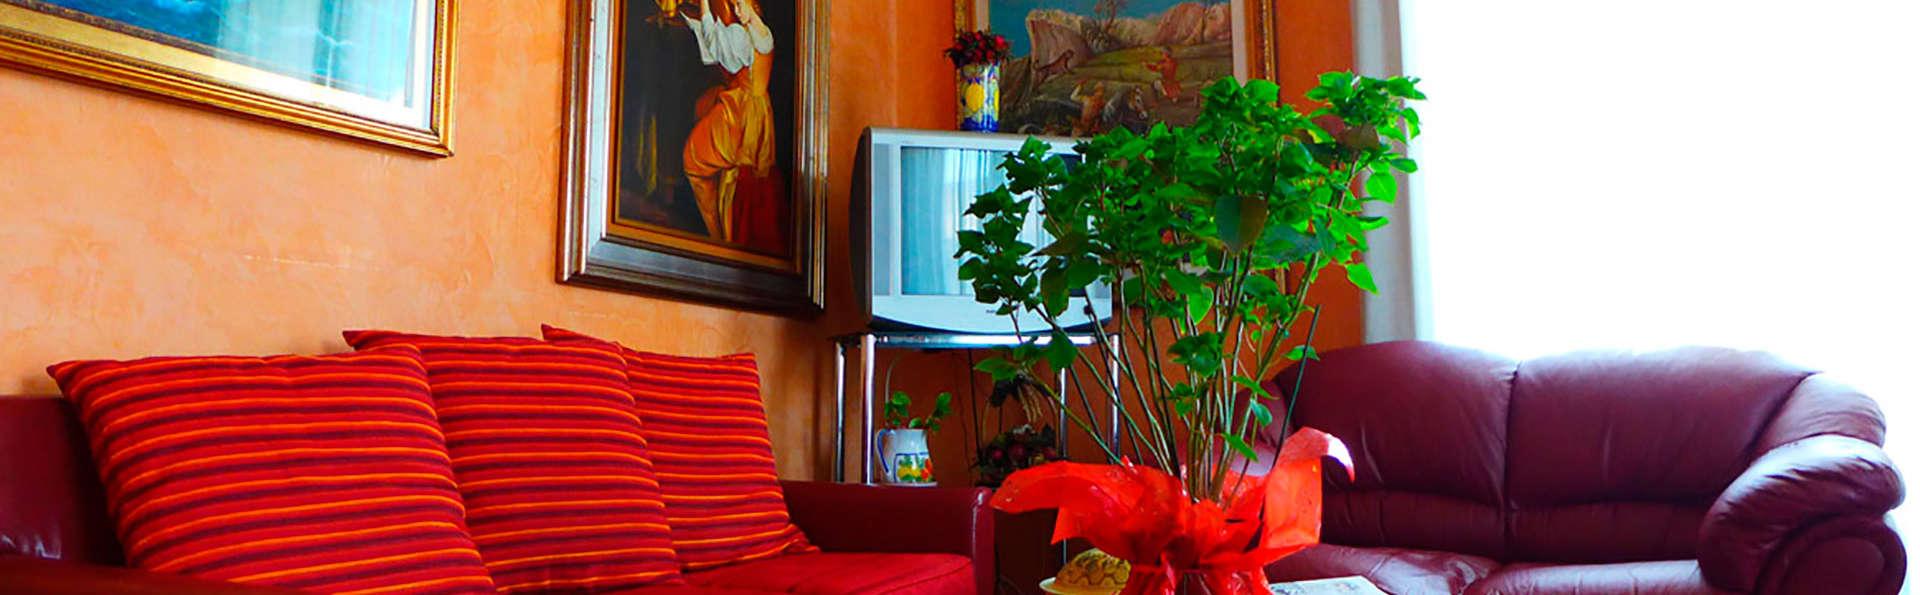 Hotel Moderno - EDIT_salon.jpg